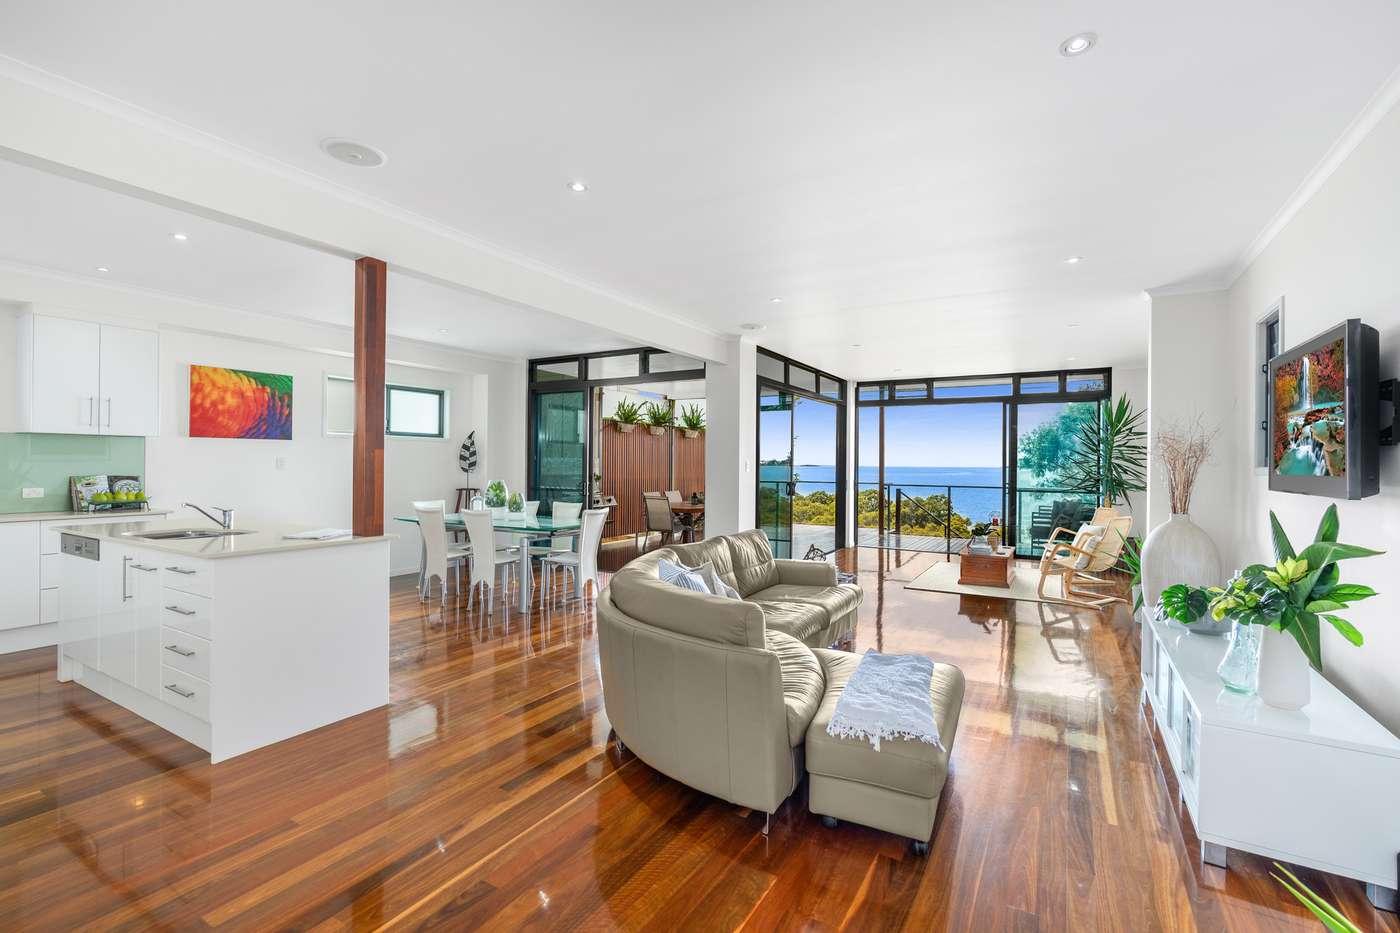 Main view of Homely house listing, 57 Mooroondu Road, Thorneside, QLD 4158